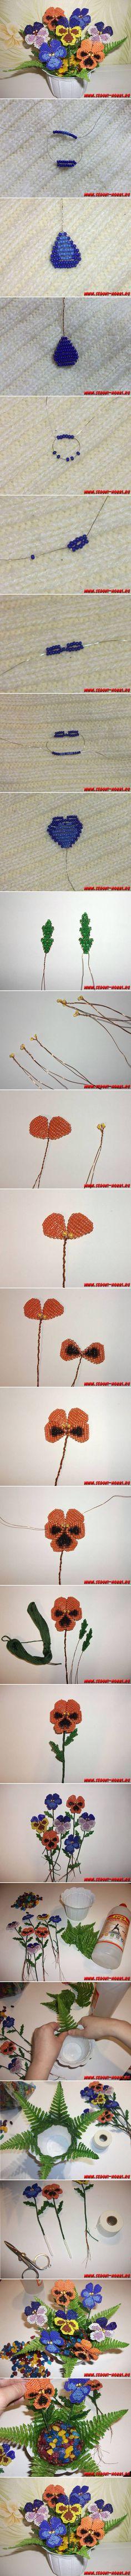 DIY Beautiful Flowers with Beads   iCreativeIdeas.com LIKE Us on Facebook ==> https://www.facebook.com/icreativeideas